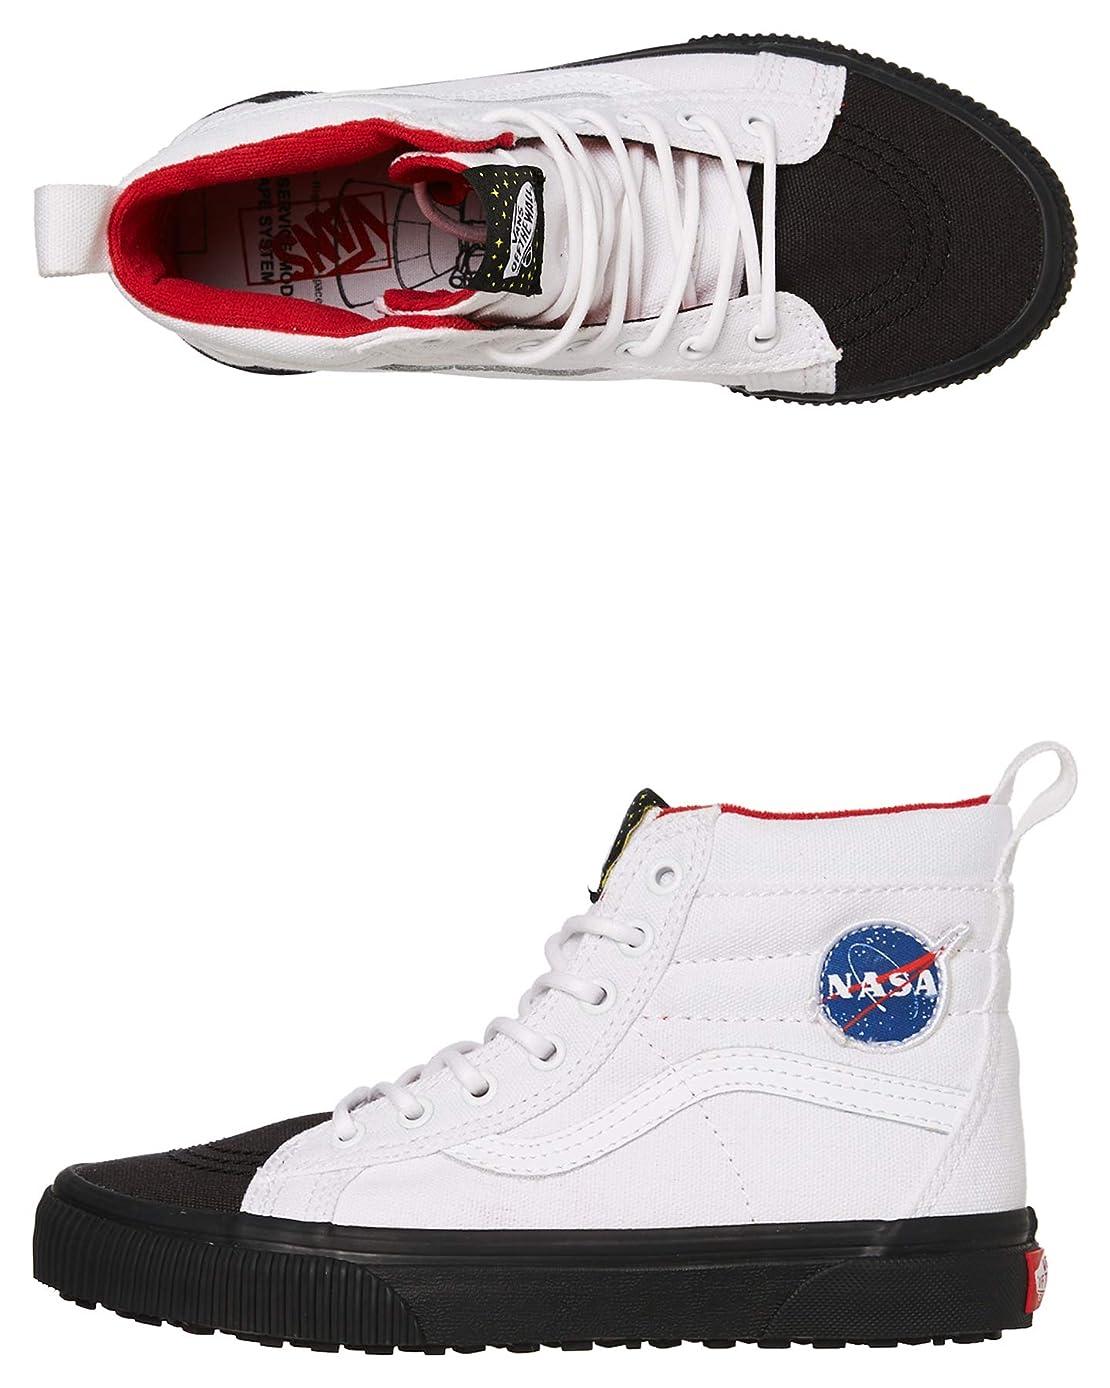 Vans Kids X NASA Space Voyager SK8-Hi MTE Shoes